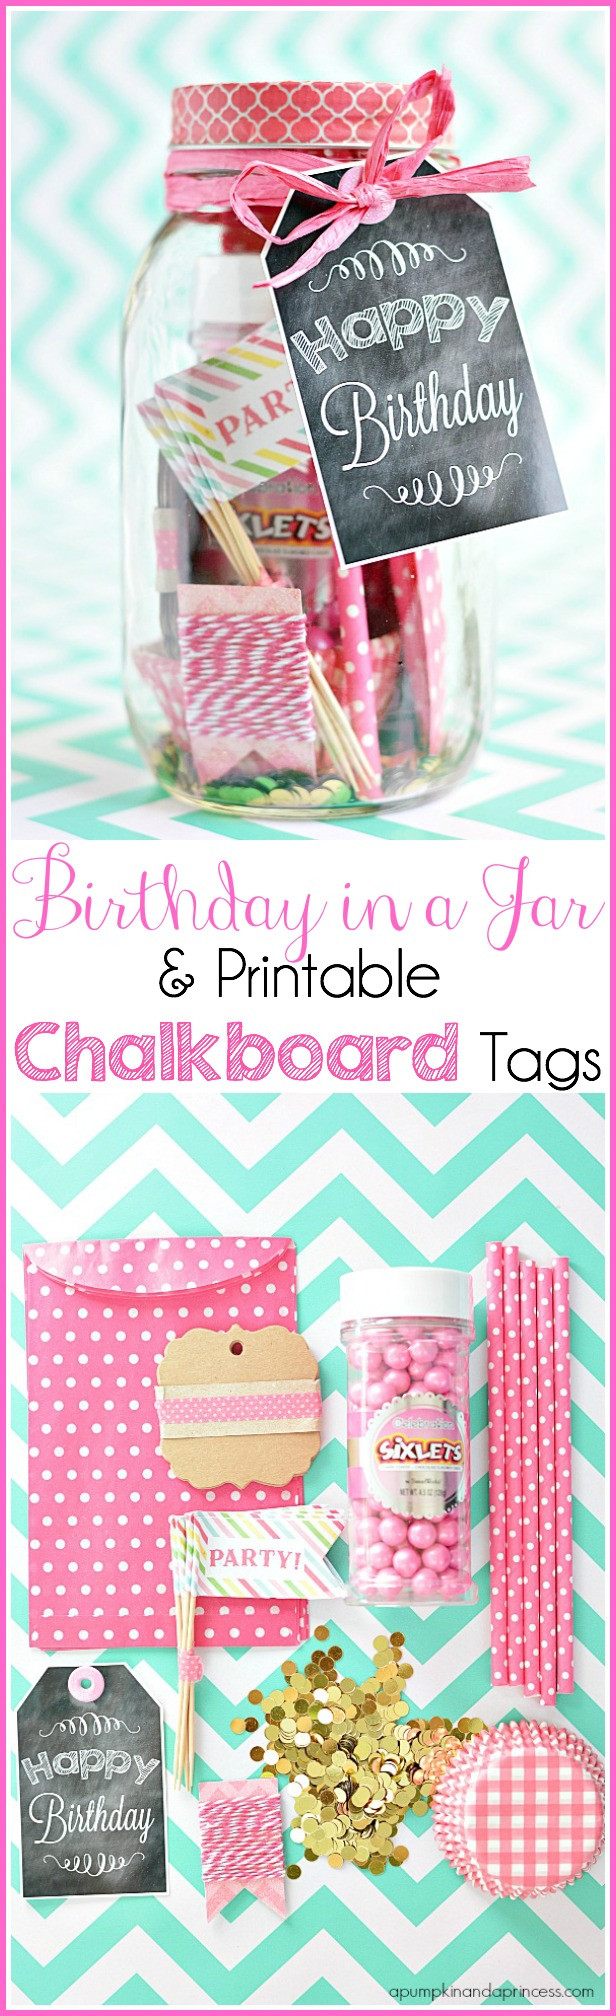 Mason Jar Birthday Gift Ideas  Birthday In A Jar Birthday Printable Tags A Pumpkin